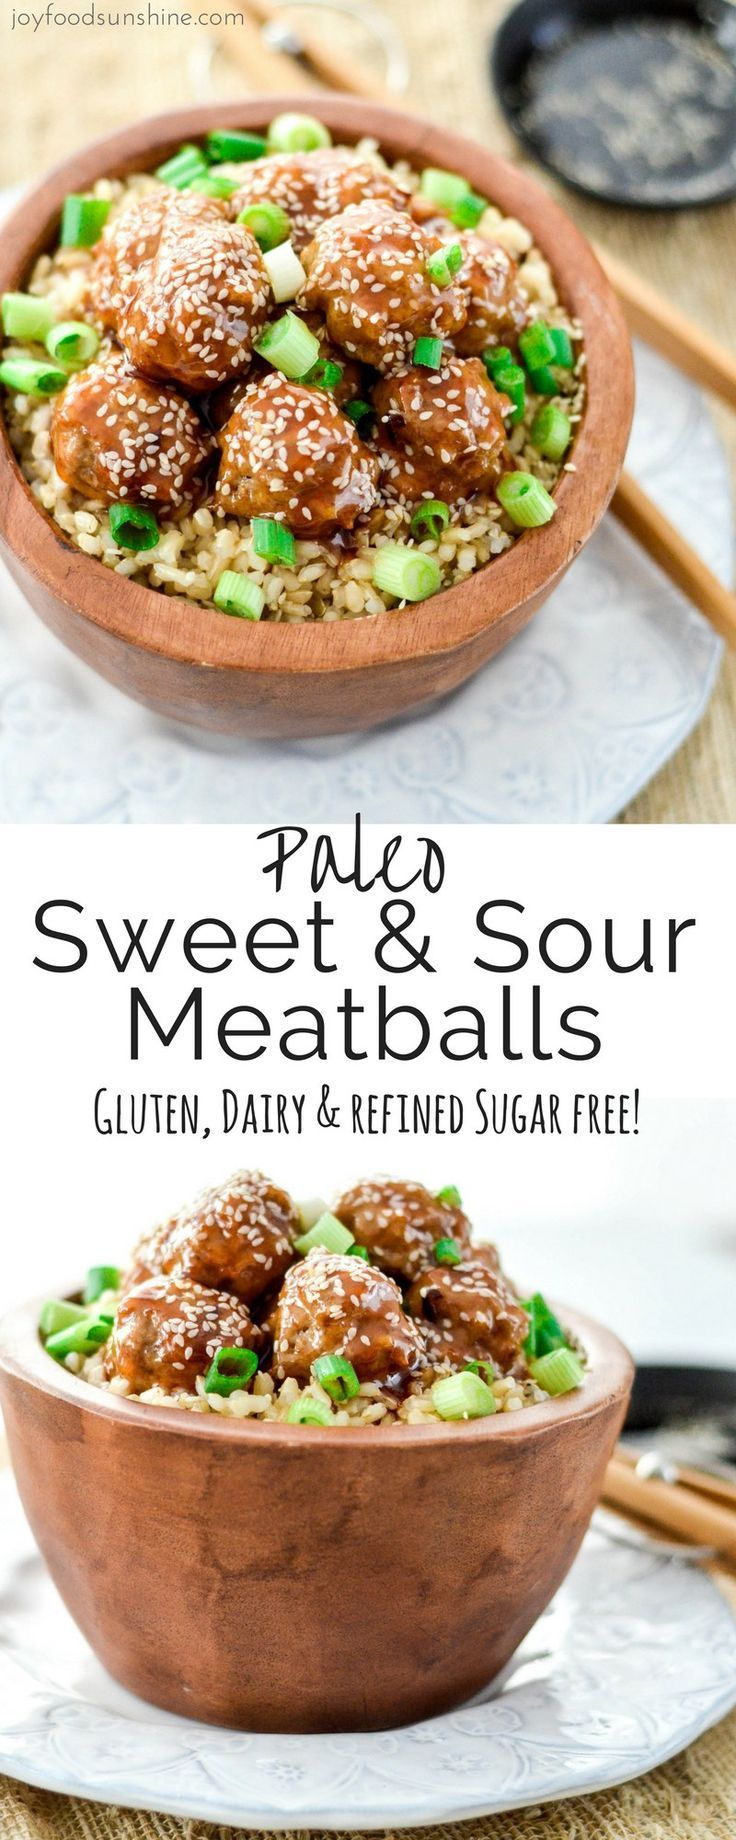 Quick easy sugar free recipes